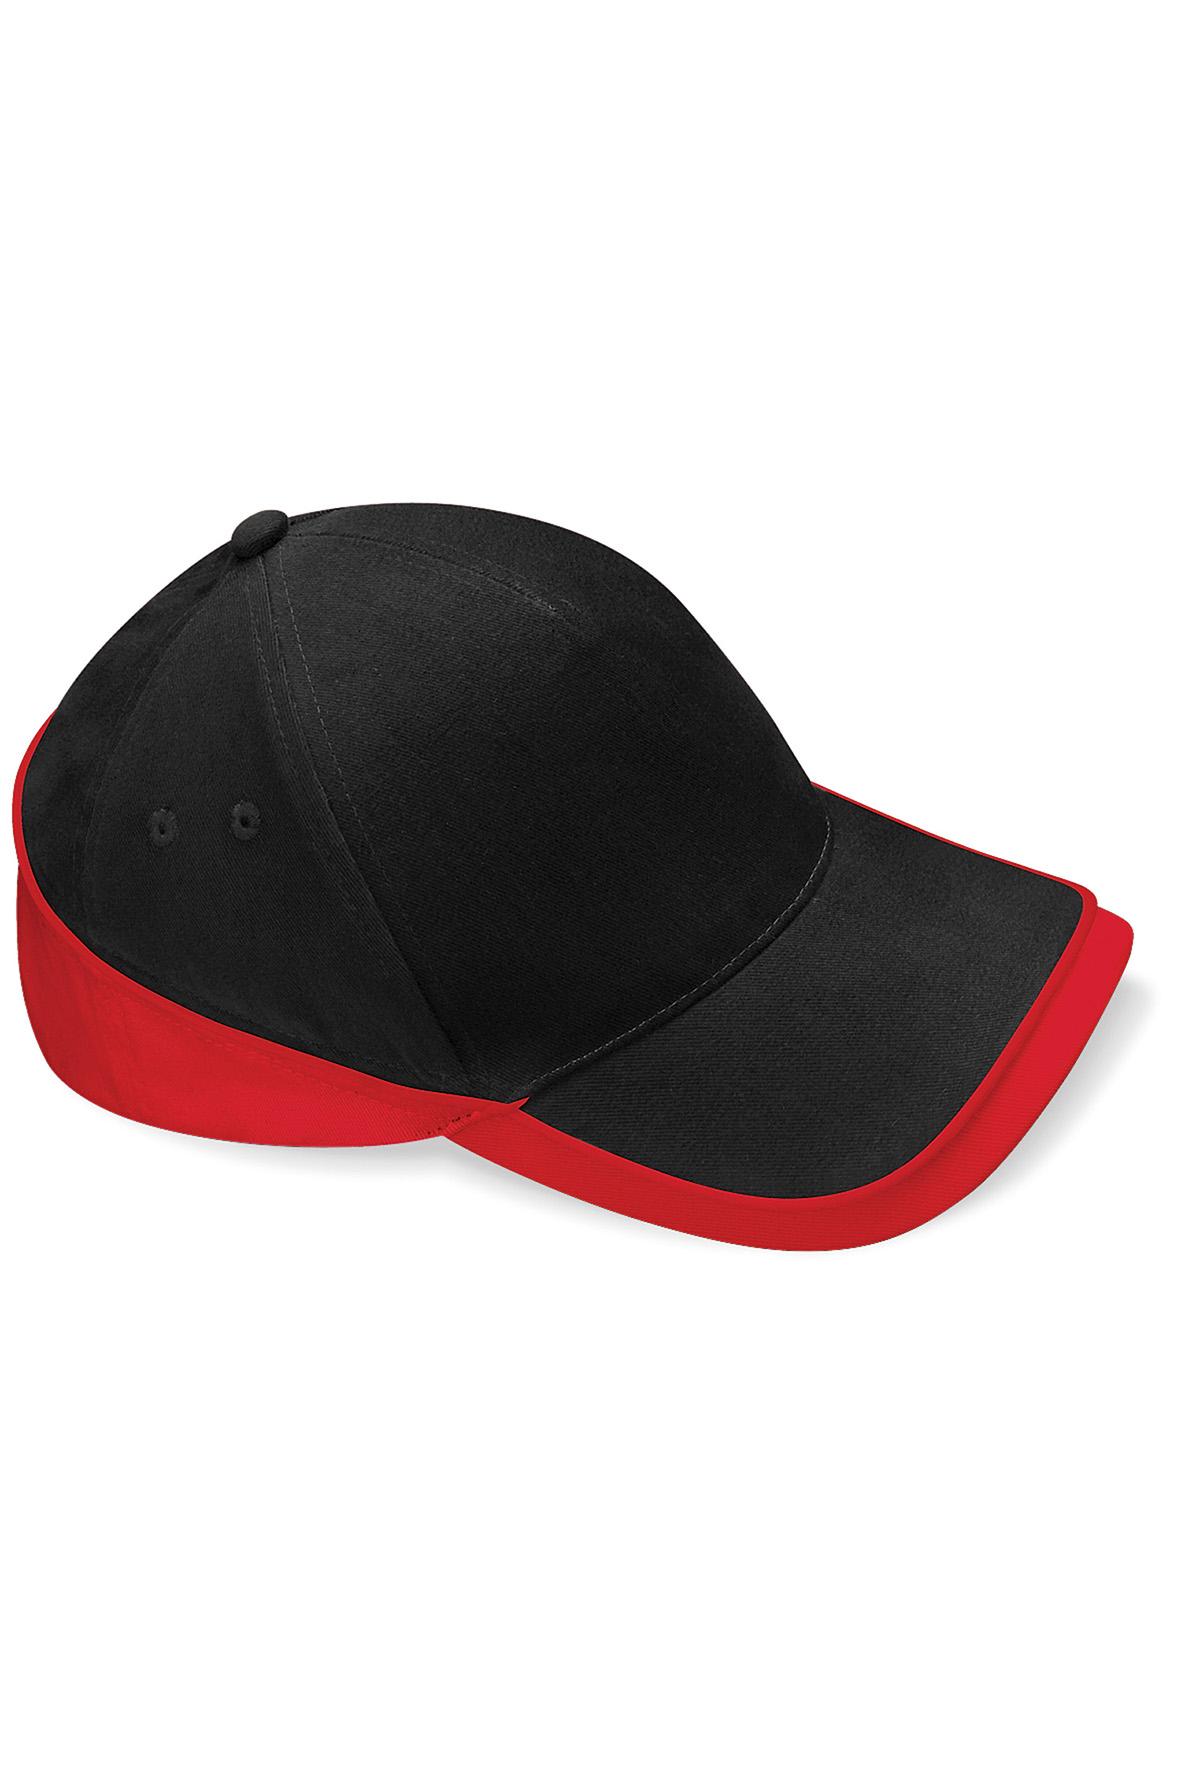 Teamwear Lippis Musta - Classic Red